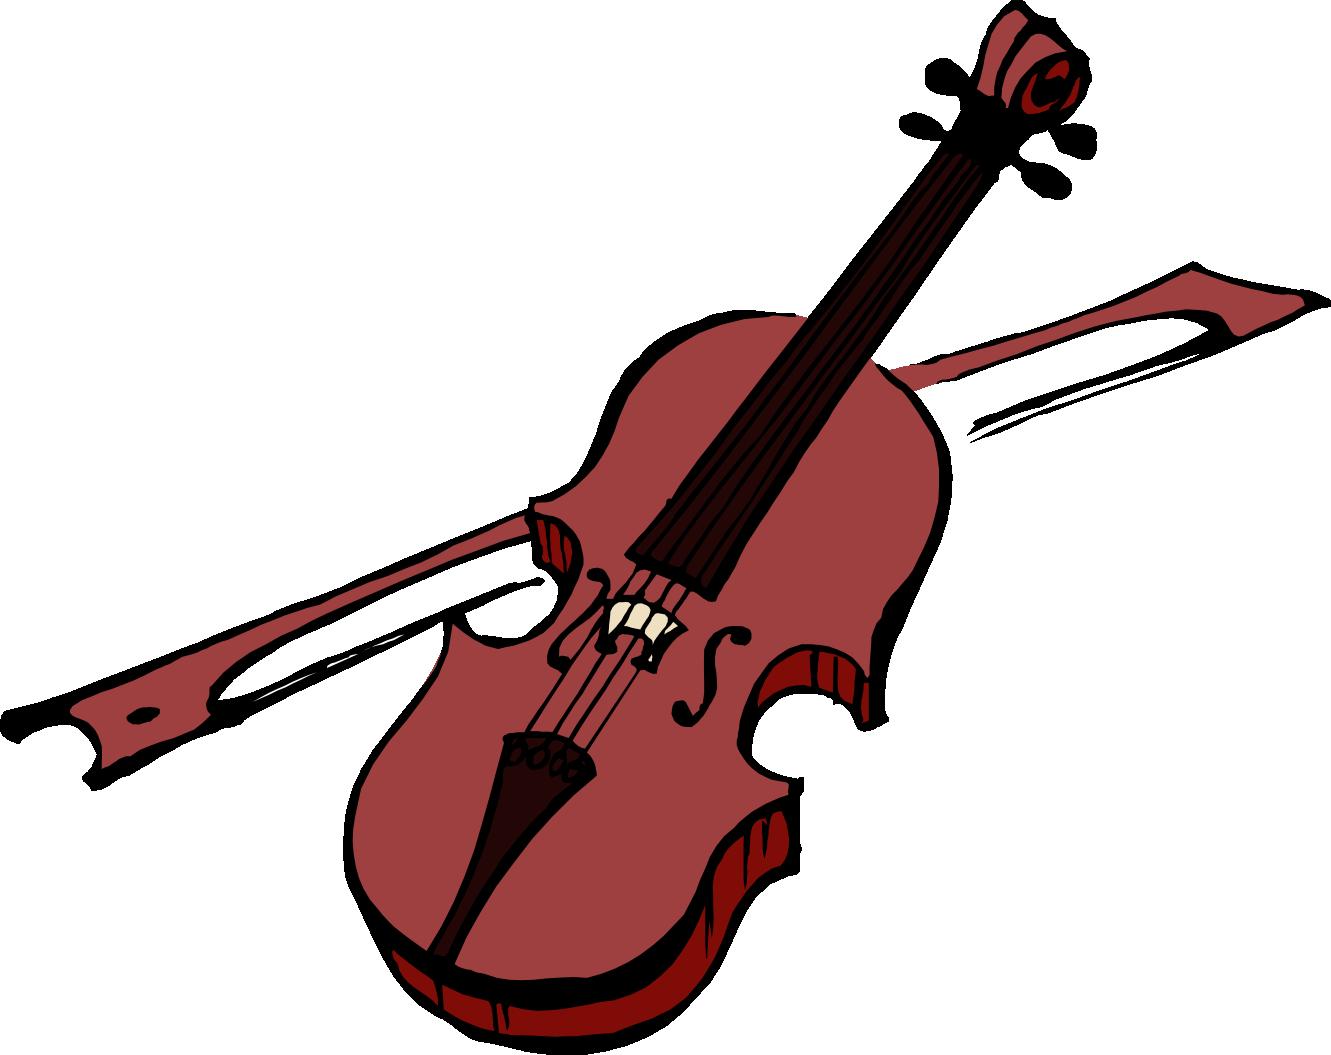 Violin - ClipArt Best